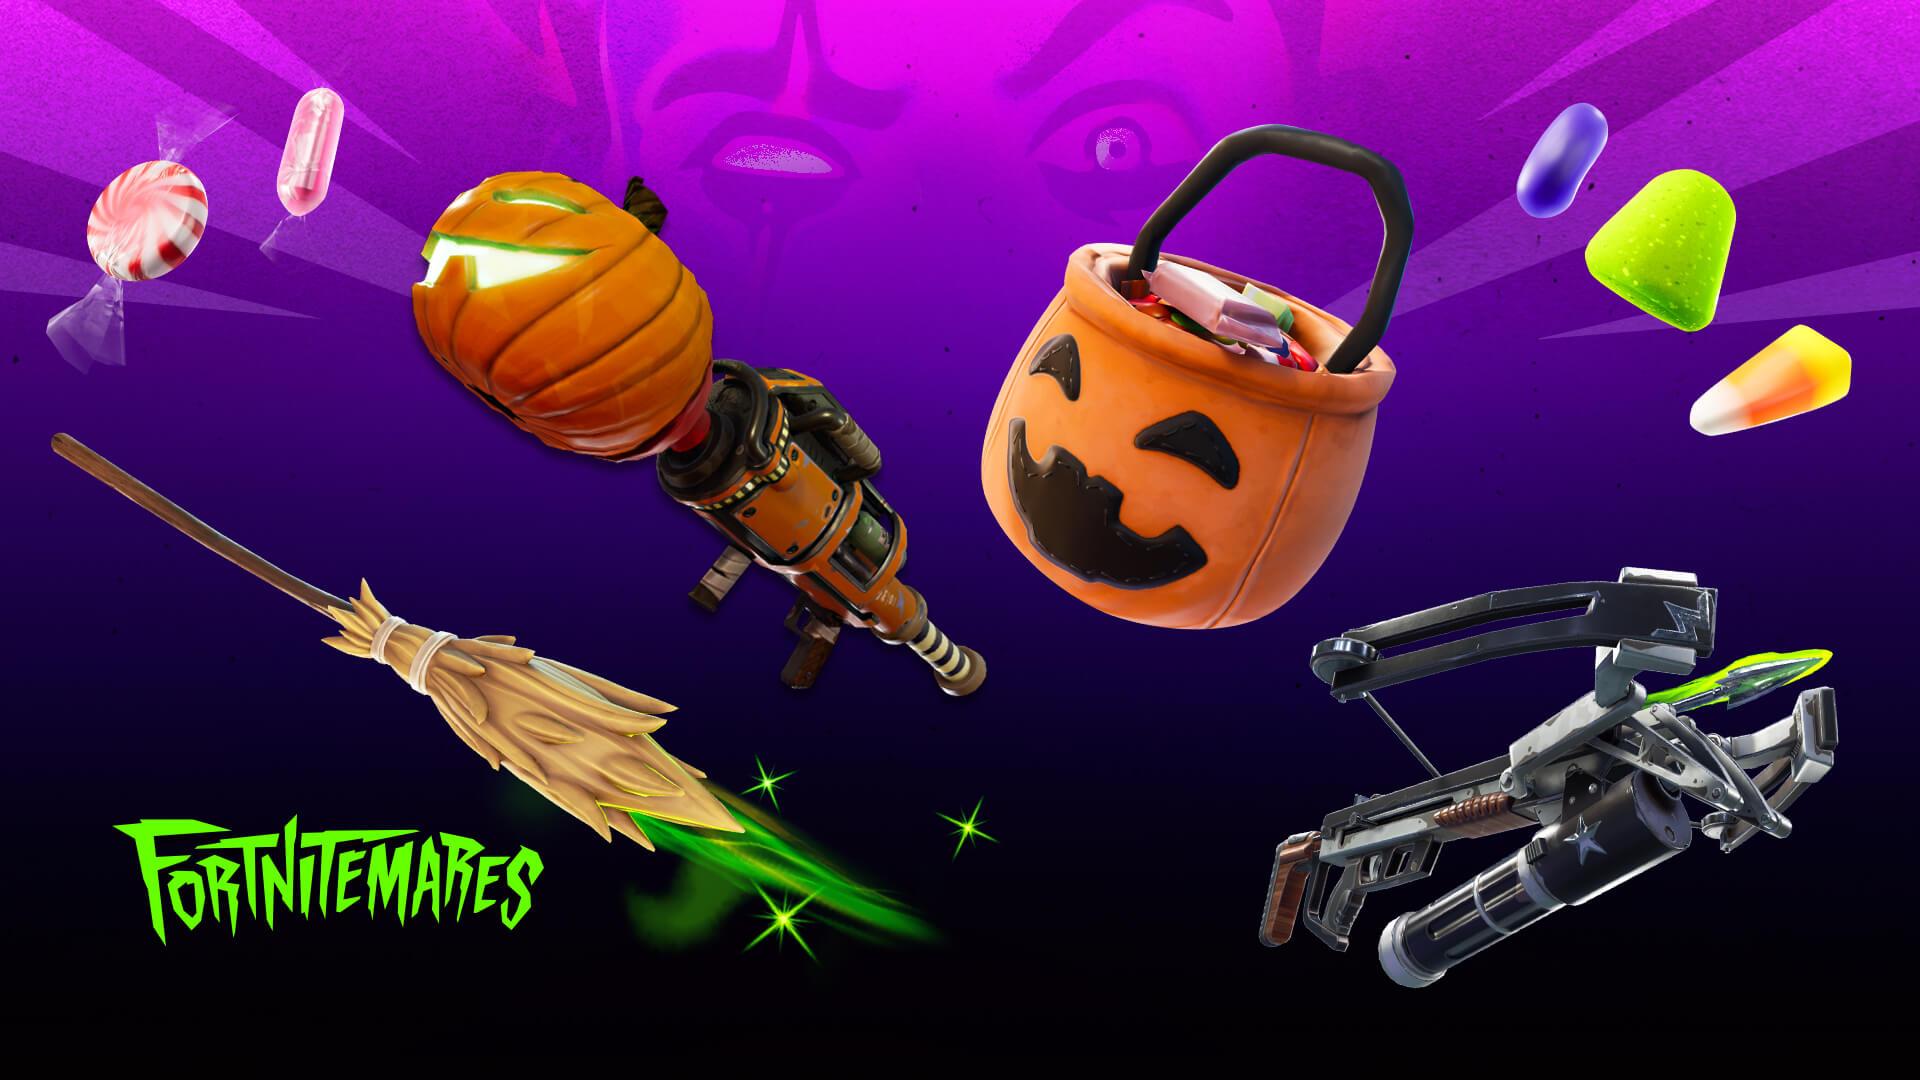 Fortnite Halloween Fortnitemares Event Kicks Off Today October 21